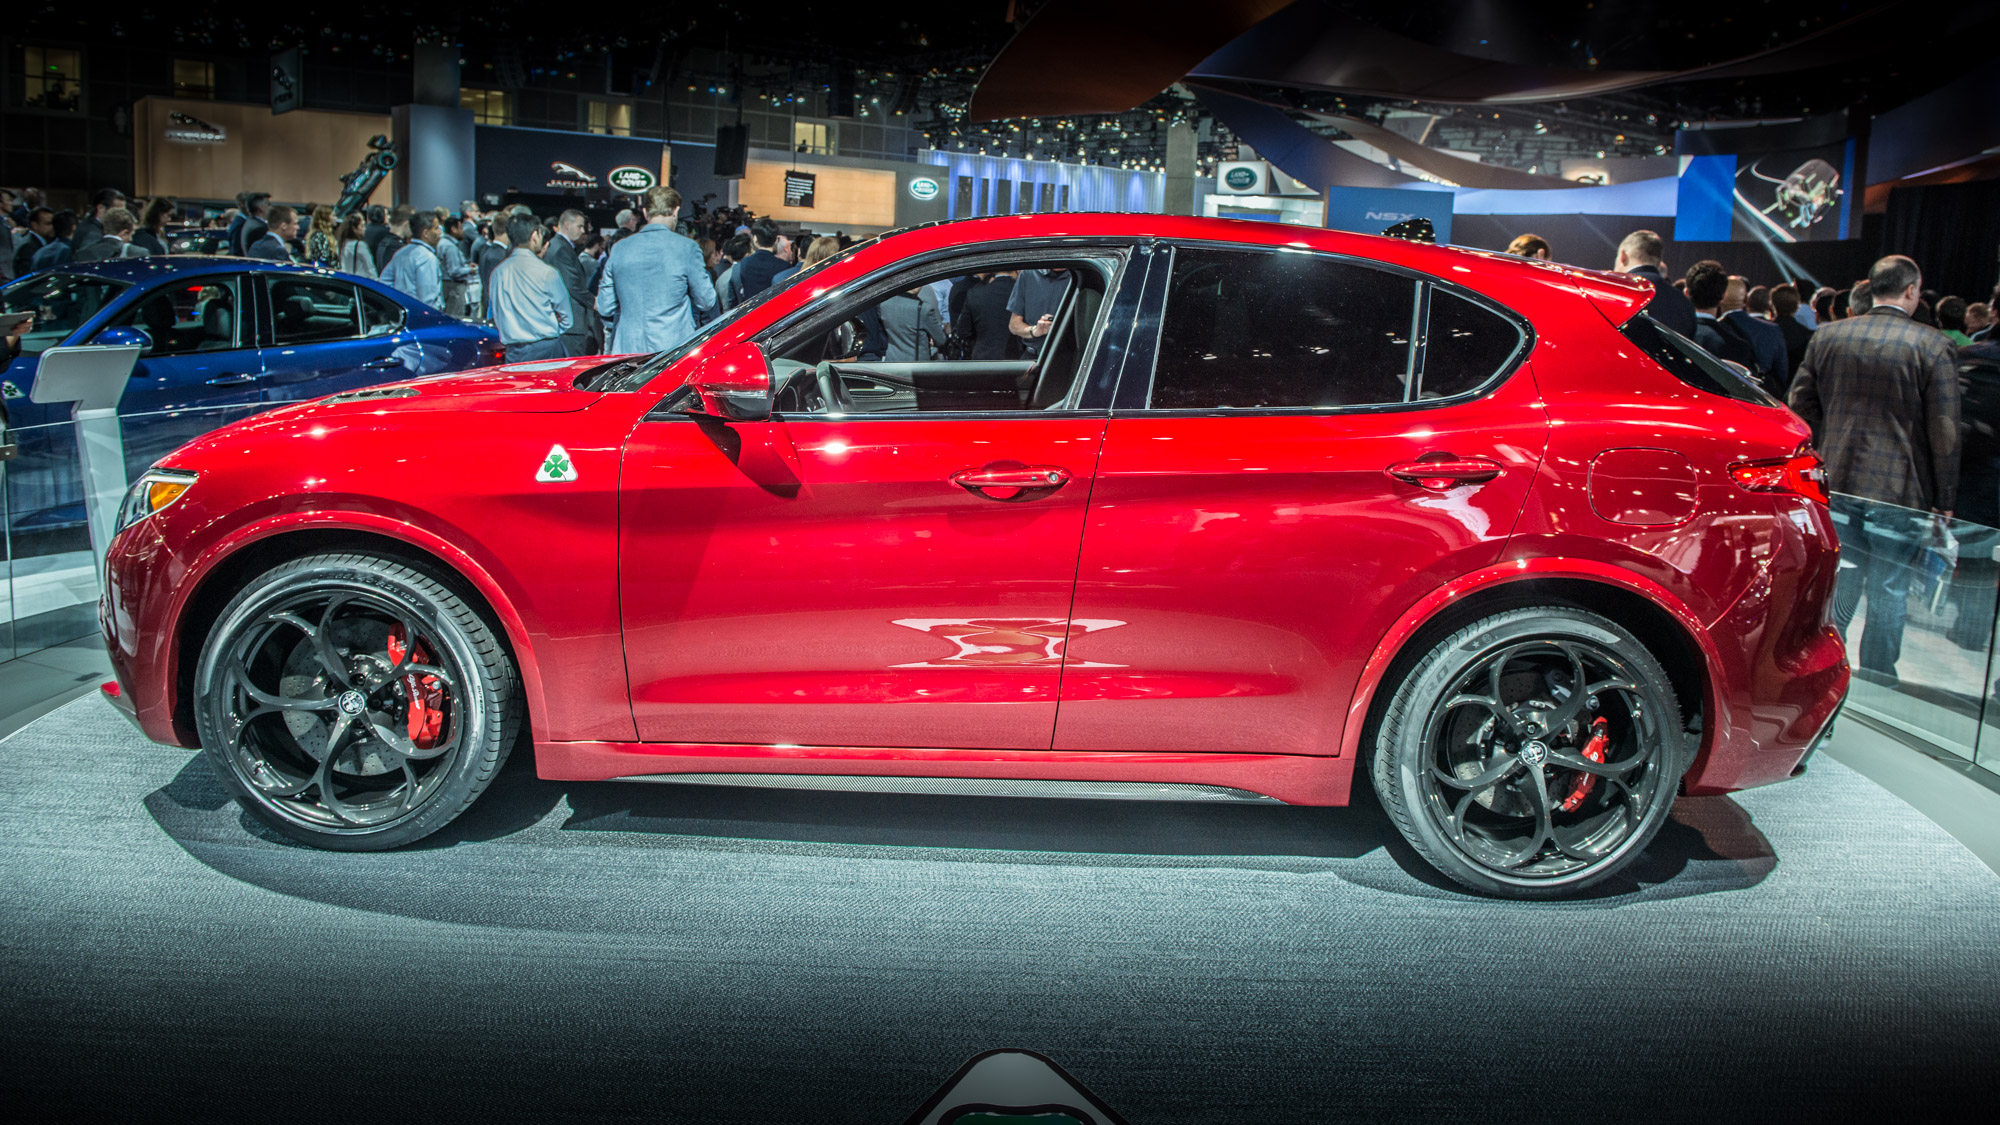 Meet Alfa Romeo's First SUV, The Stelvio